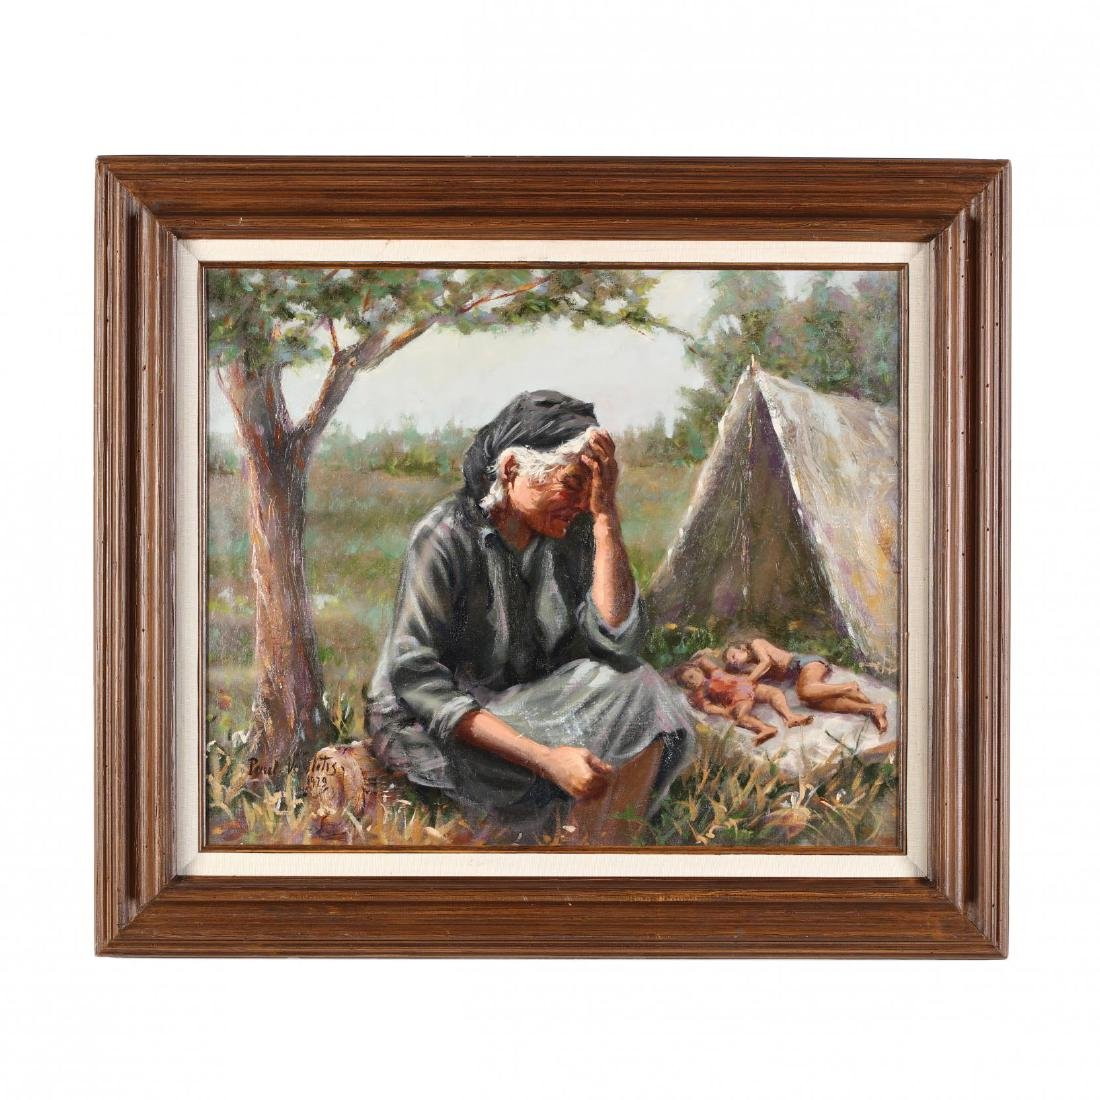 Paul Vavlitis (Cypriot-American, 1914-2004), Grieving